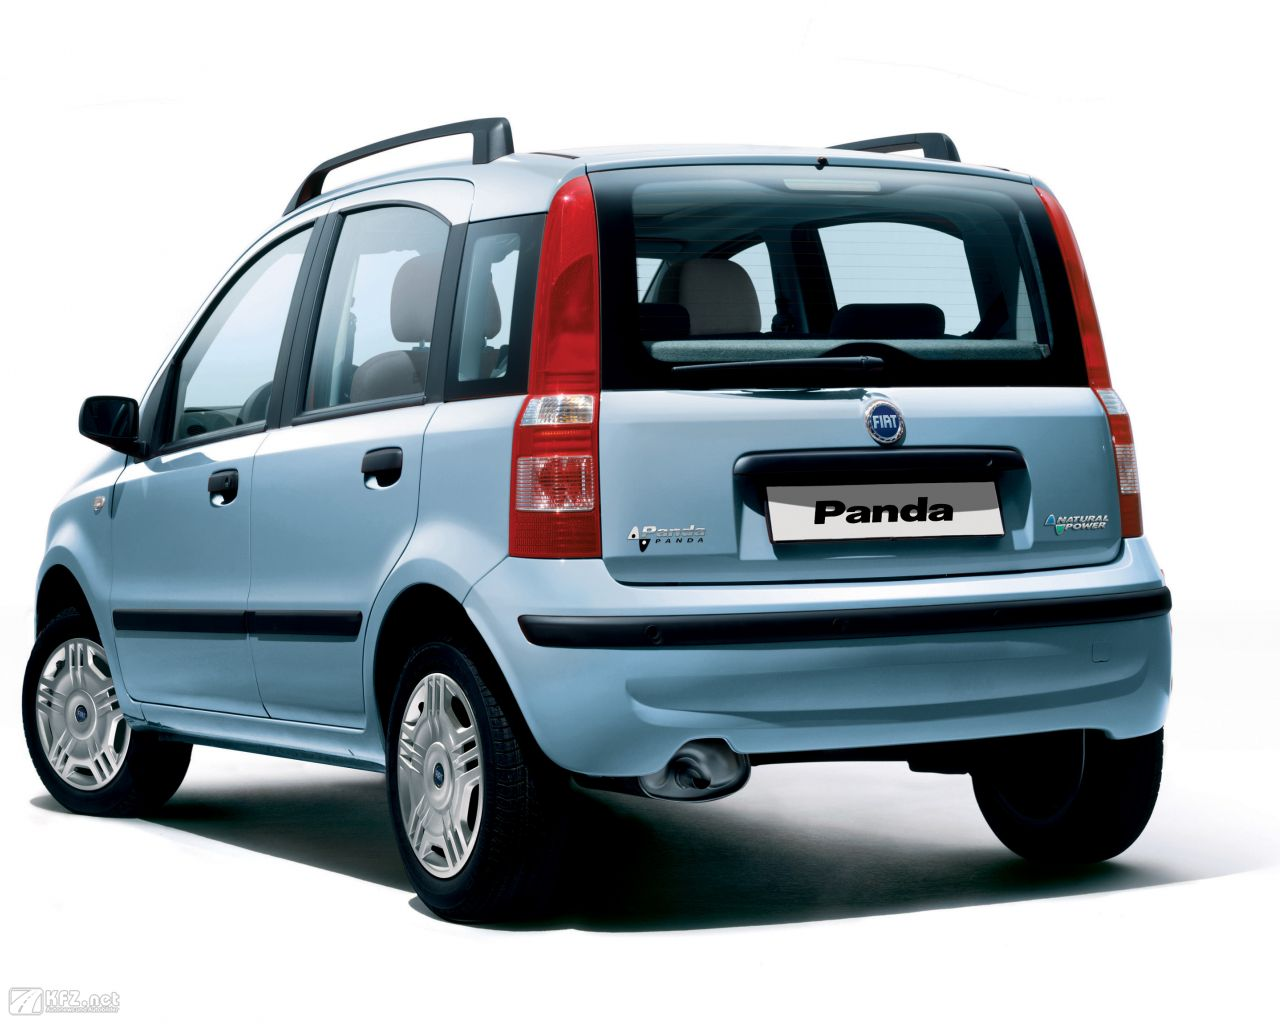 fiat-panda-1280x1024-5